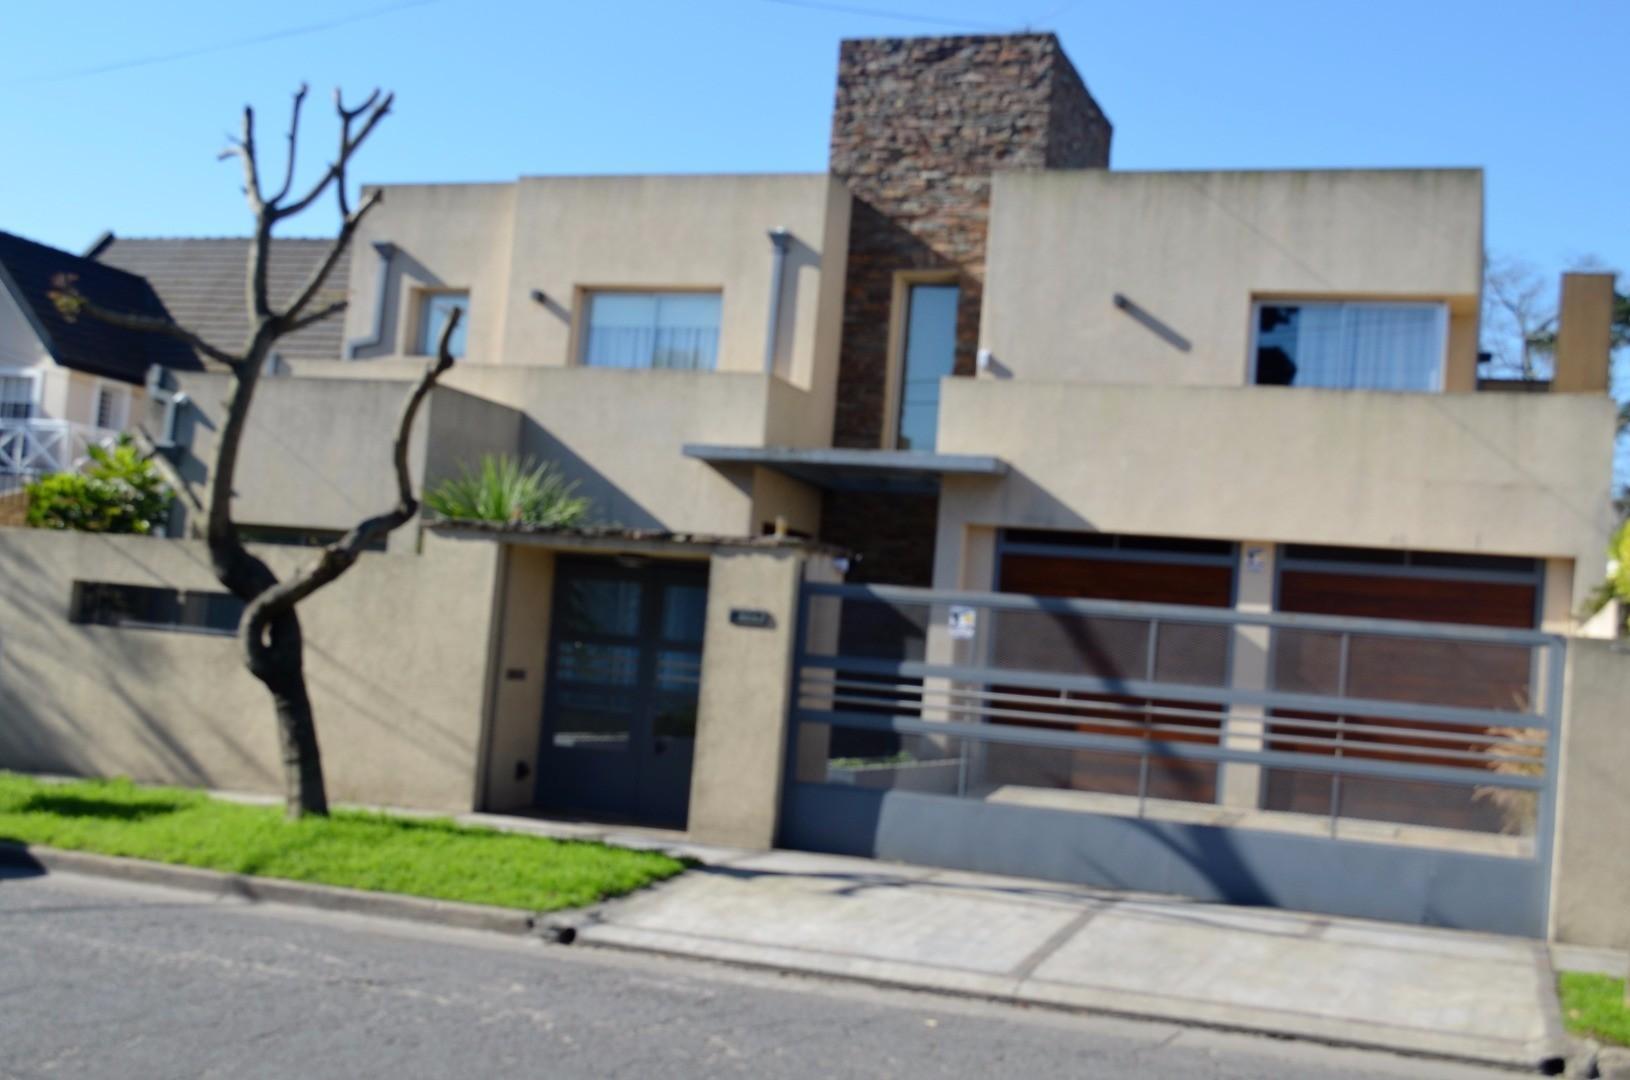 Estupenda mansión de estilo moderno con detalles de categoría en zona residencial Hurlingham.